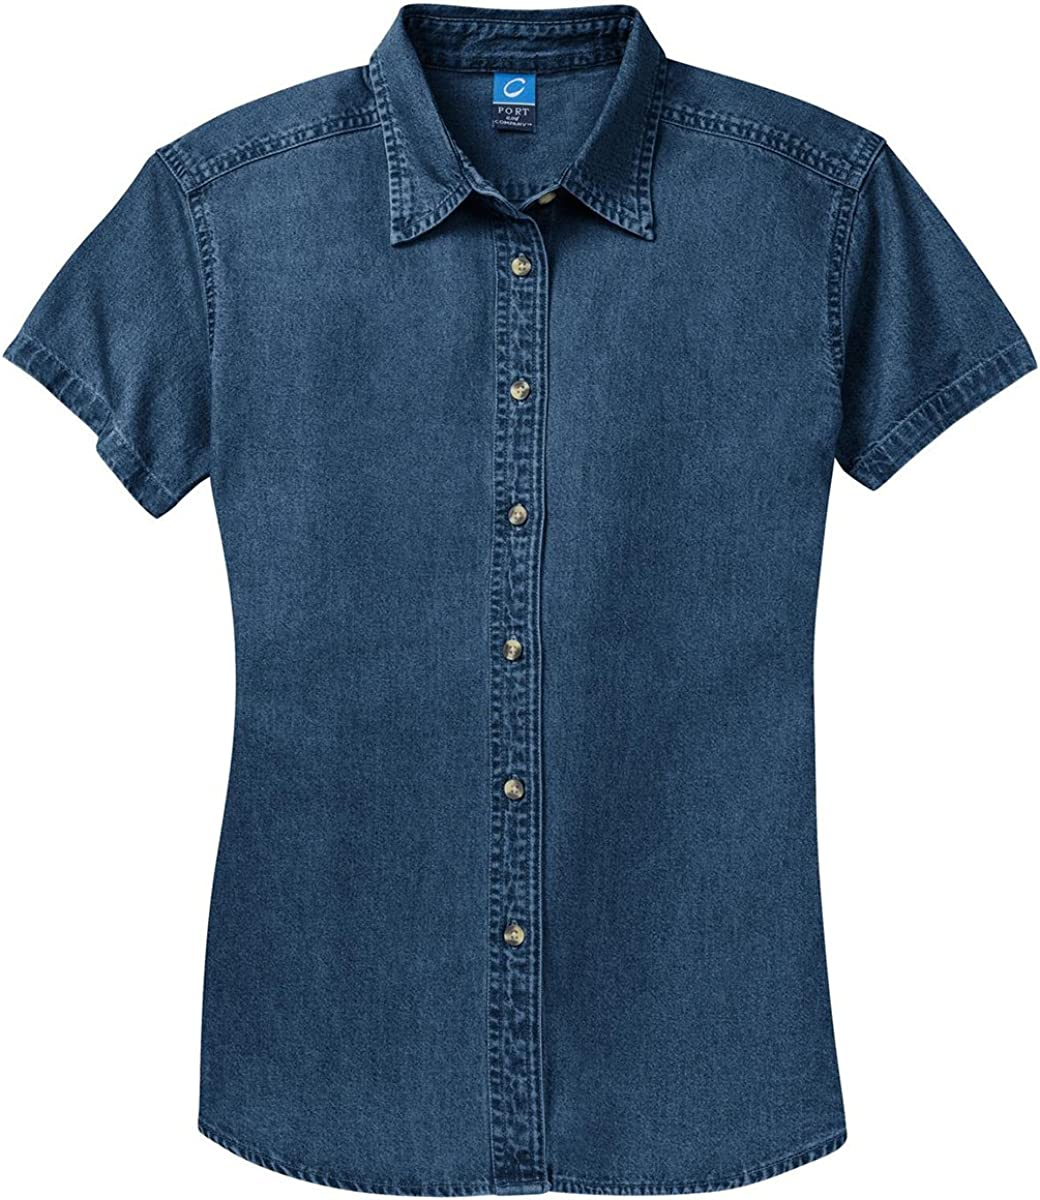 Short Sleeve Value Denim Shirt. Port /& Company